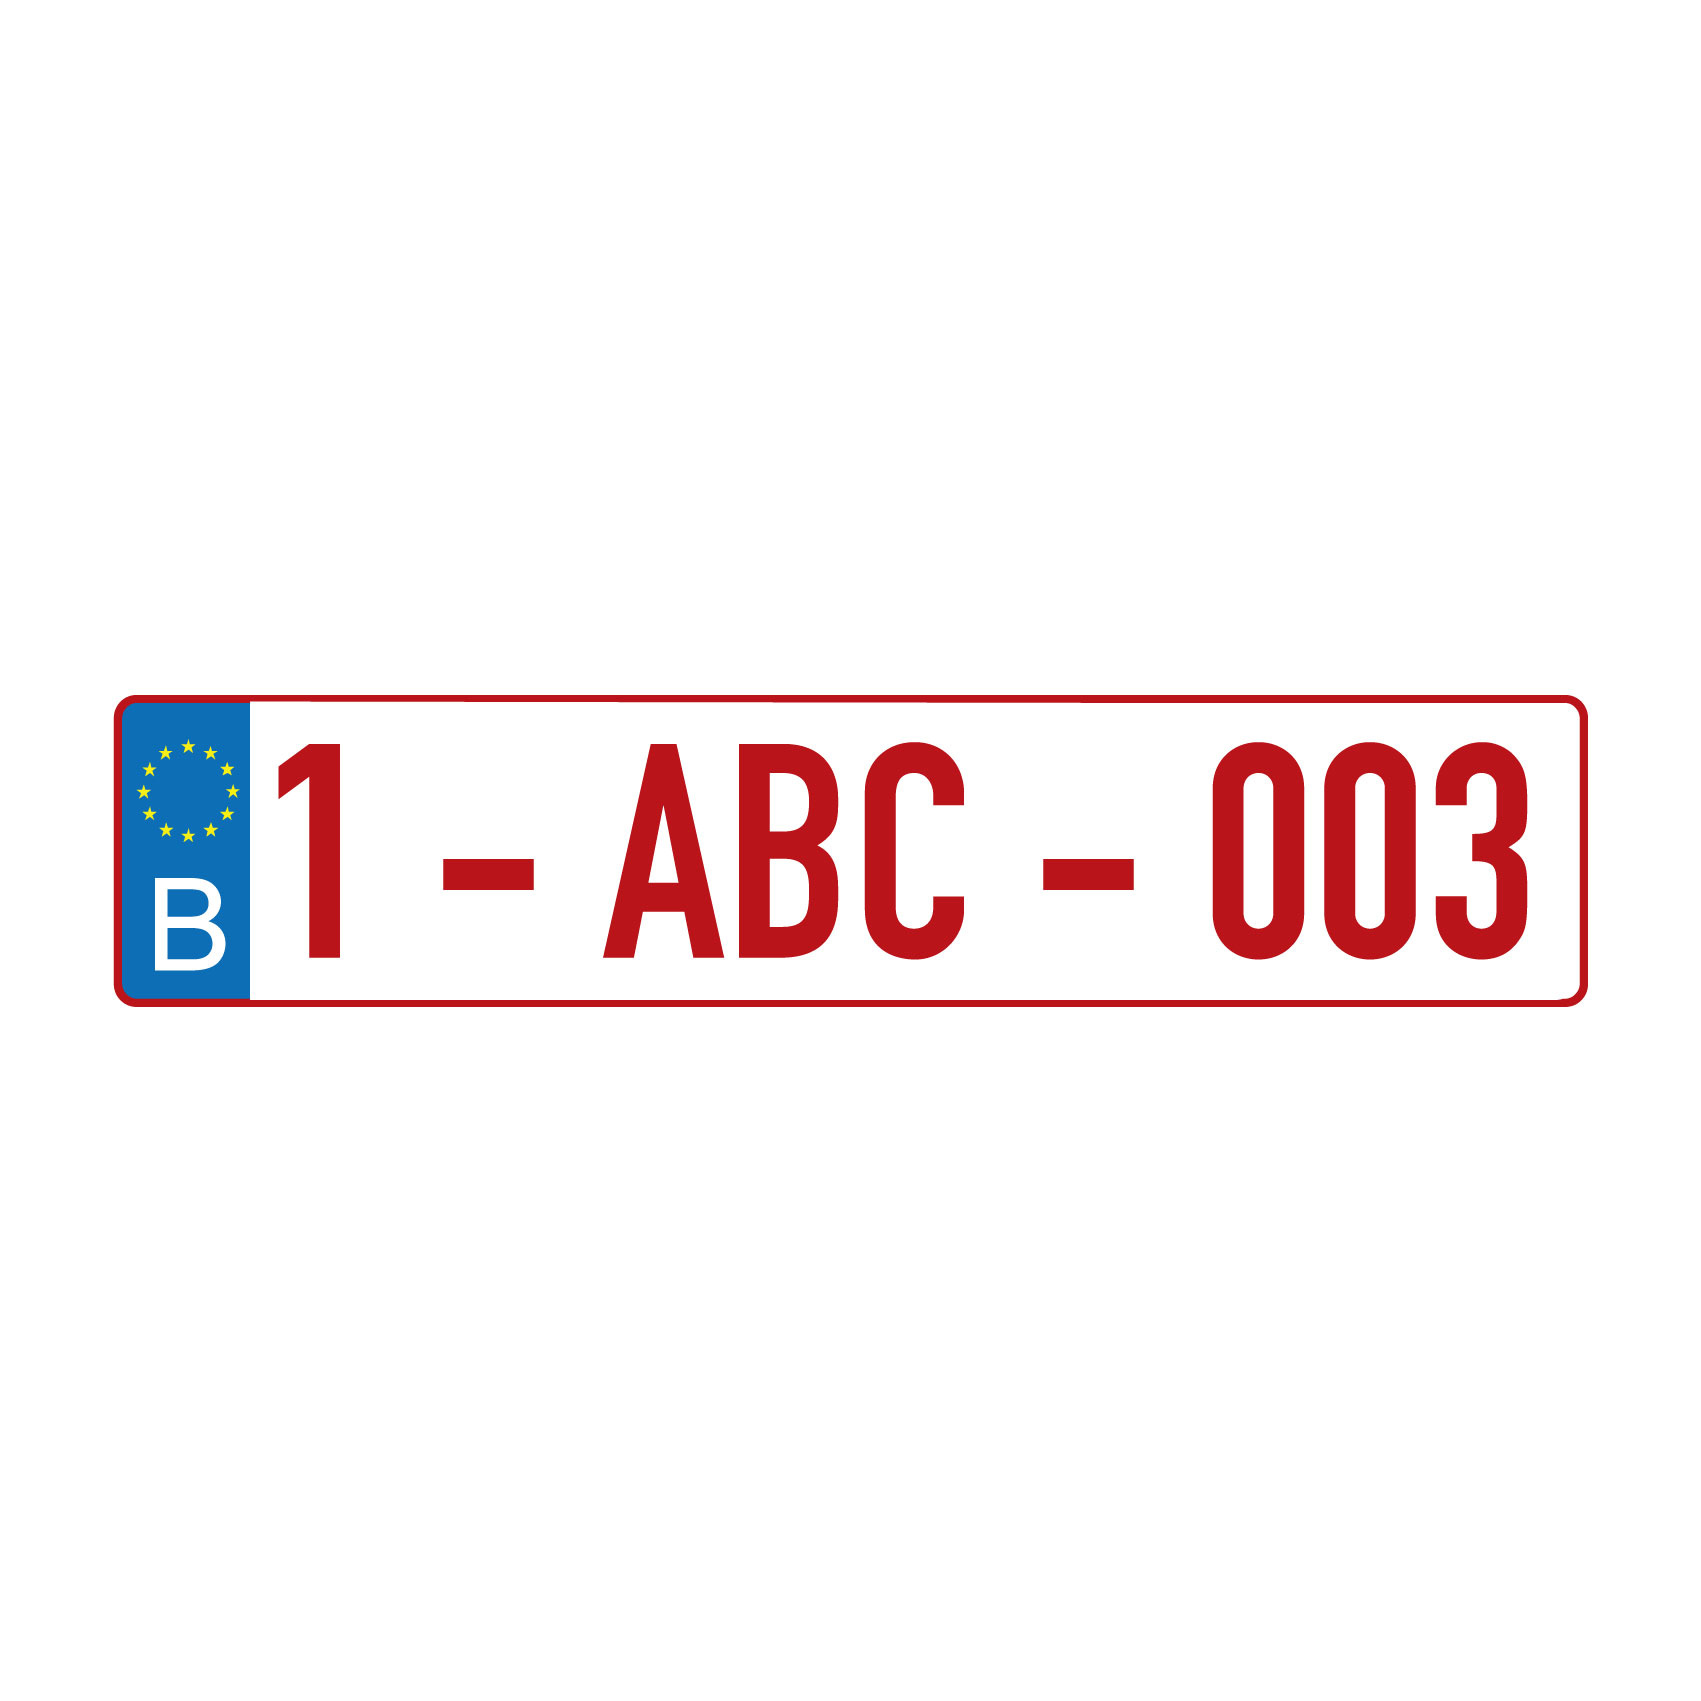 Dutch licence plate sticker - Copy